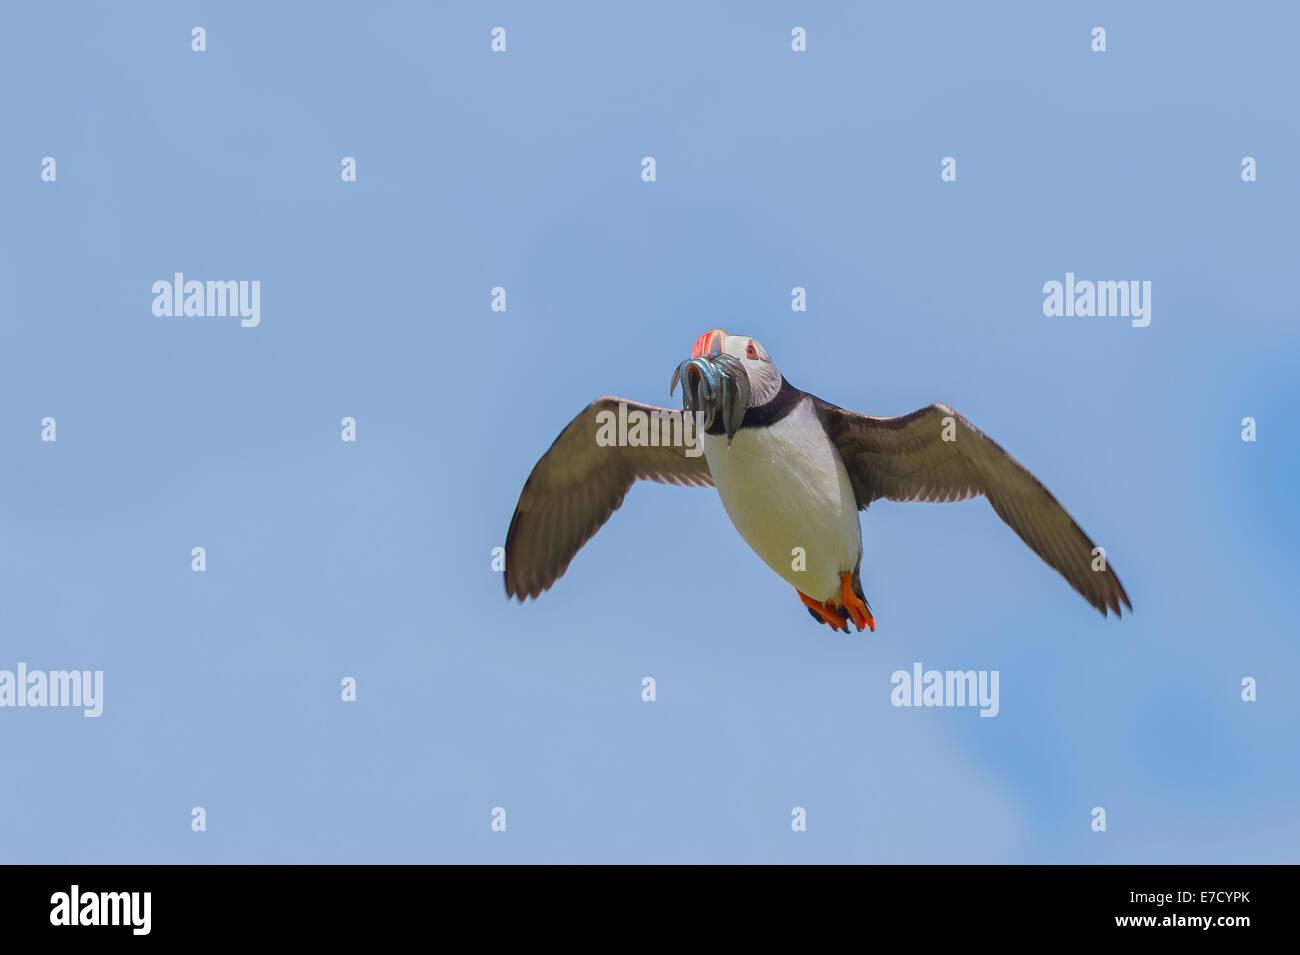 Un Frailecillo atlántico (Fratercula arctica) con un beakful de anguilas de arena, en vuelo flying airborne contra un cielo azul Foto de stock